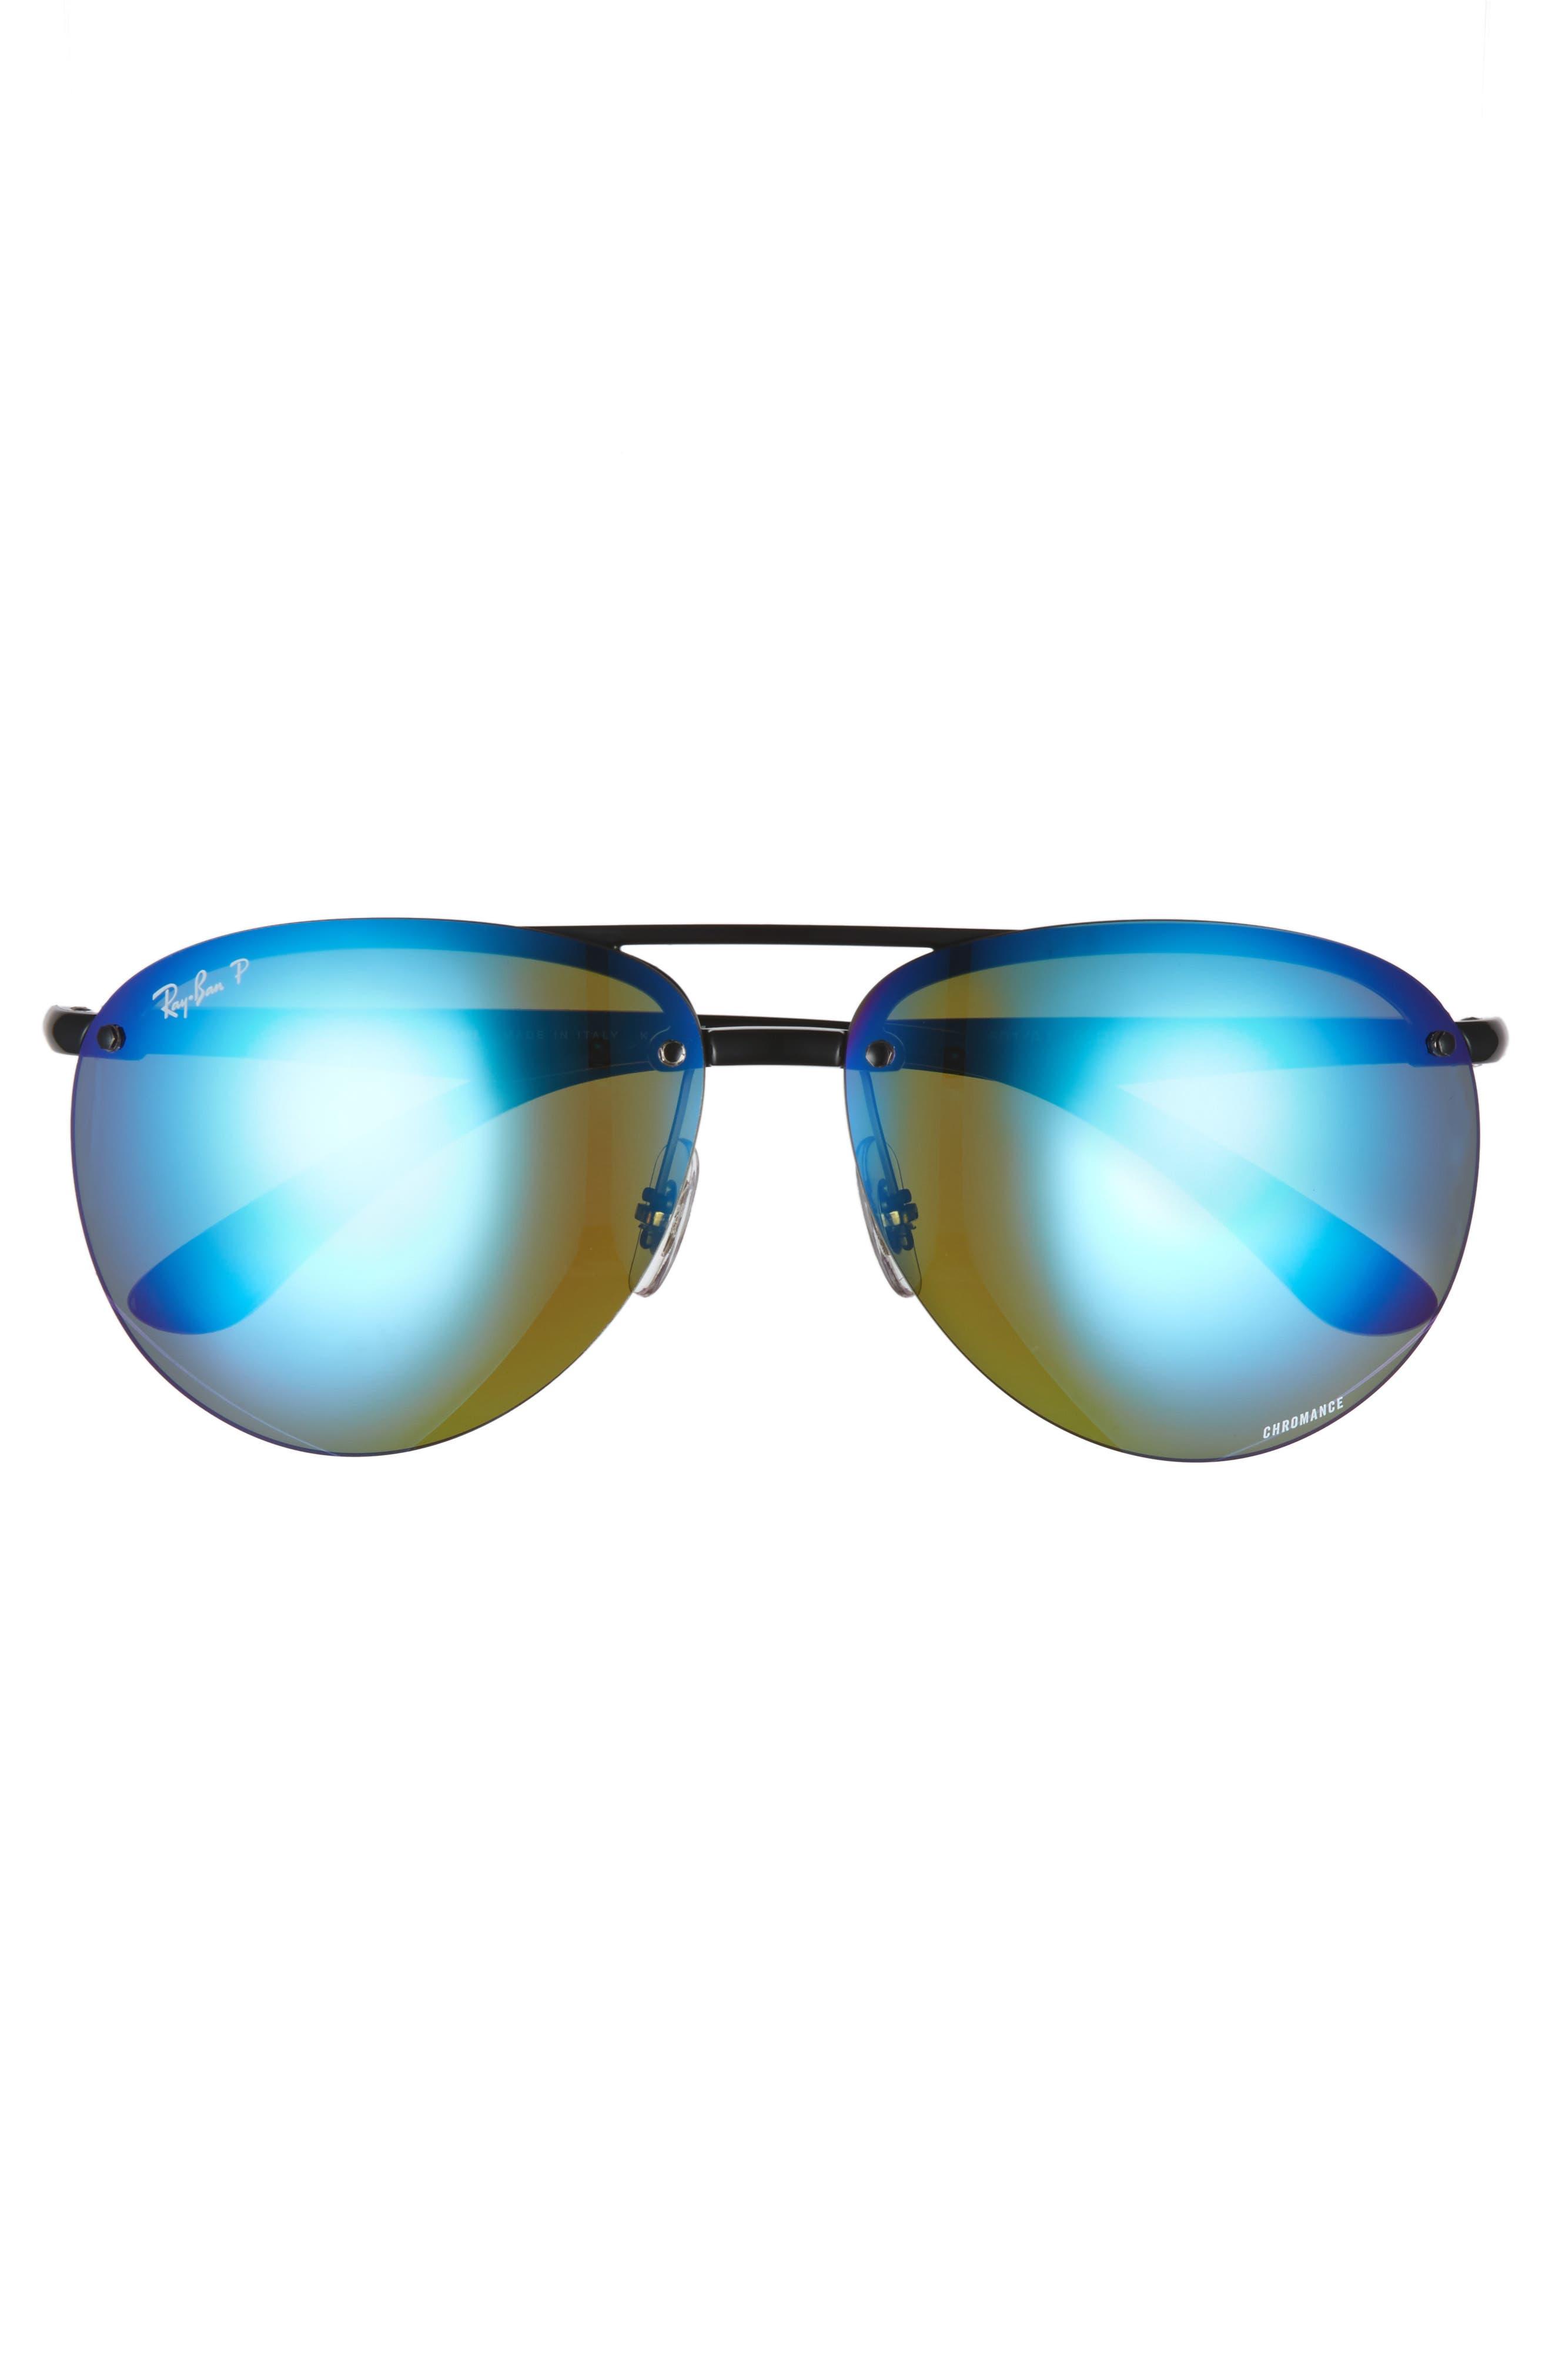 64mm Oversized Polarized Mirrored Rimless Aviator Sunglasses,                             Alternate thumbnail 3, color,                             001